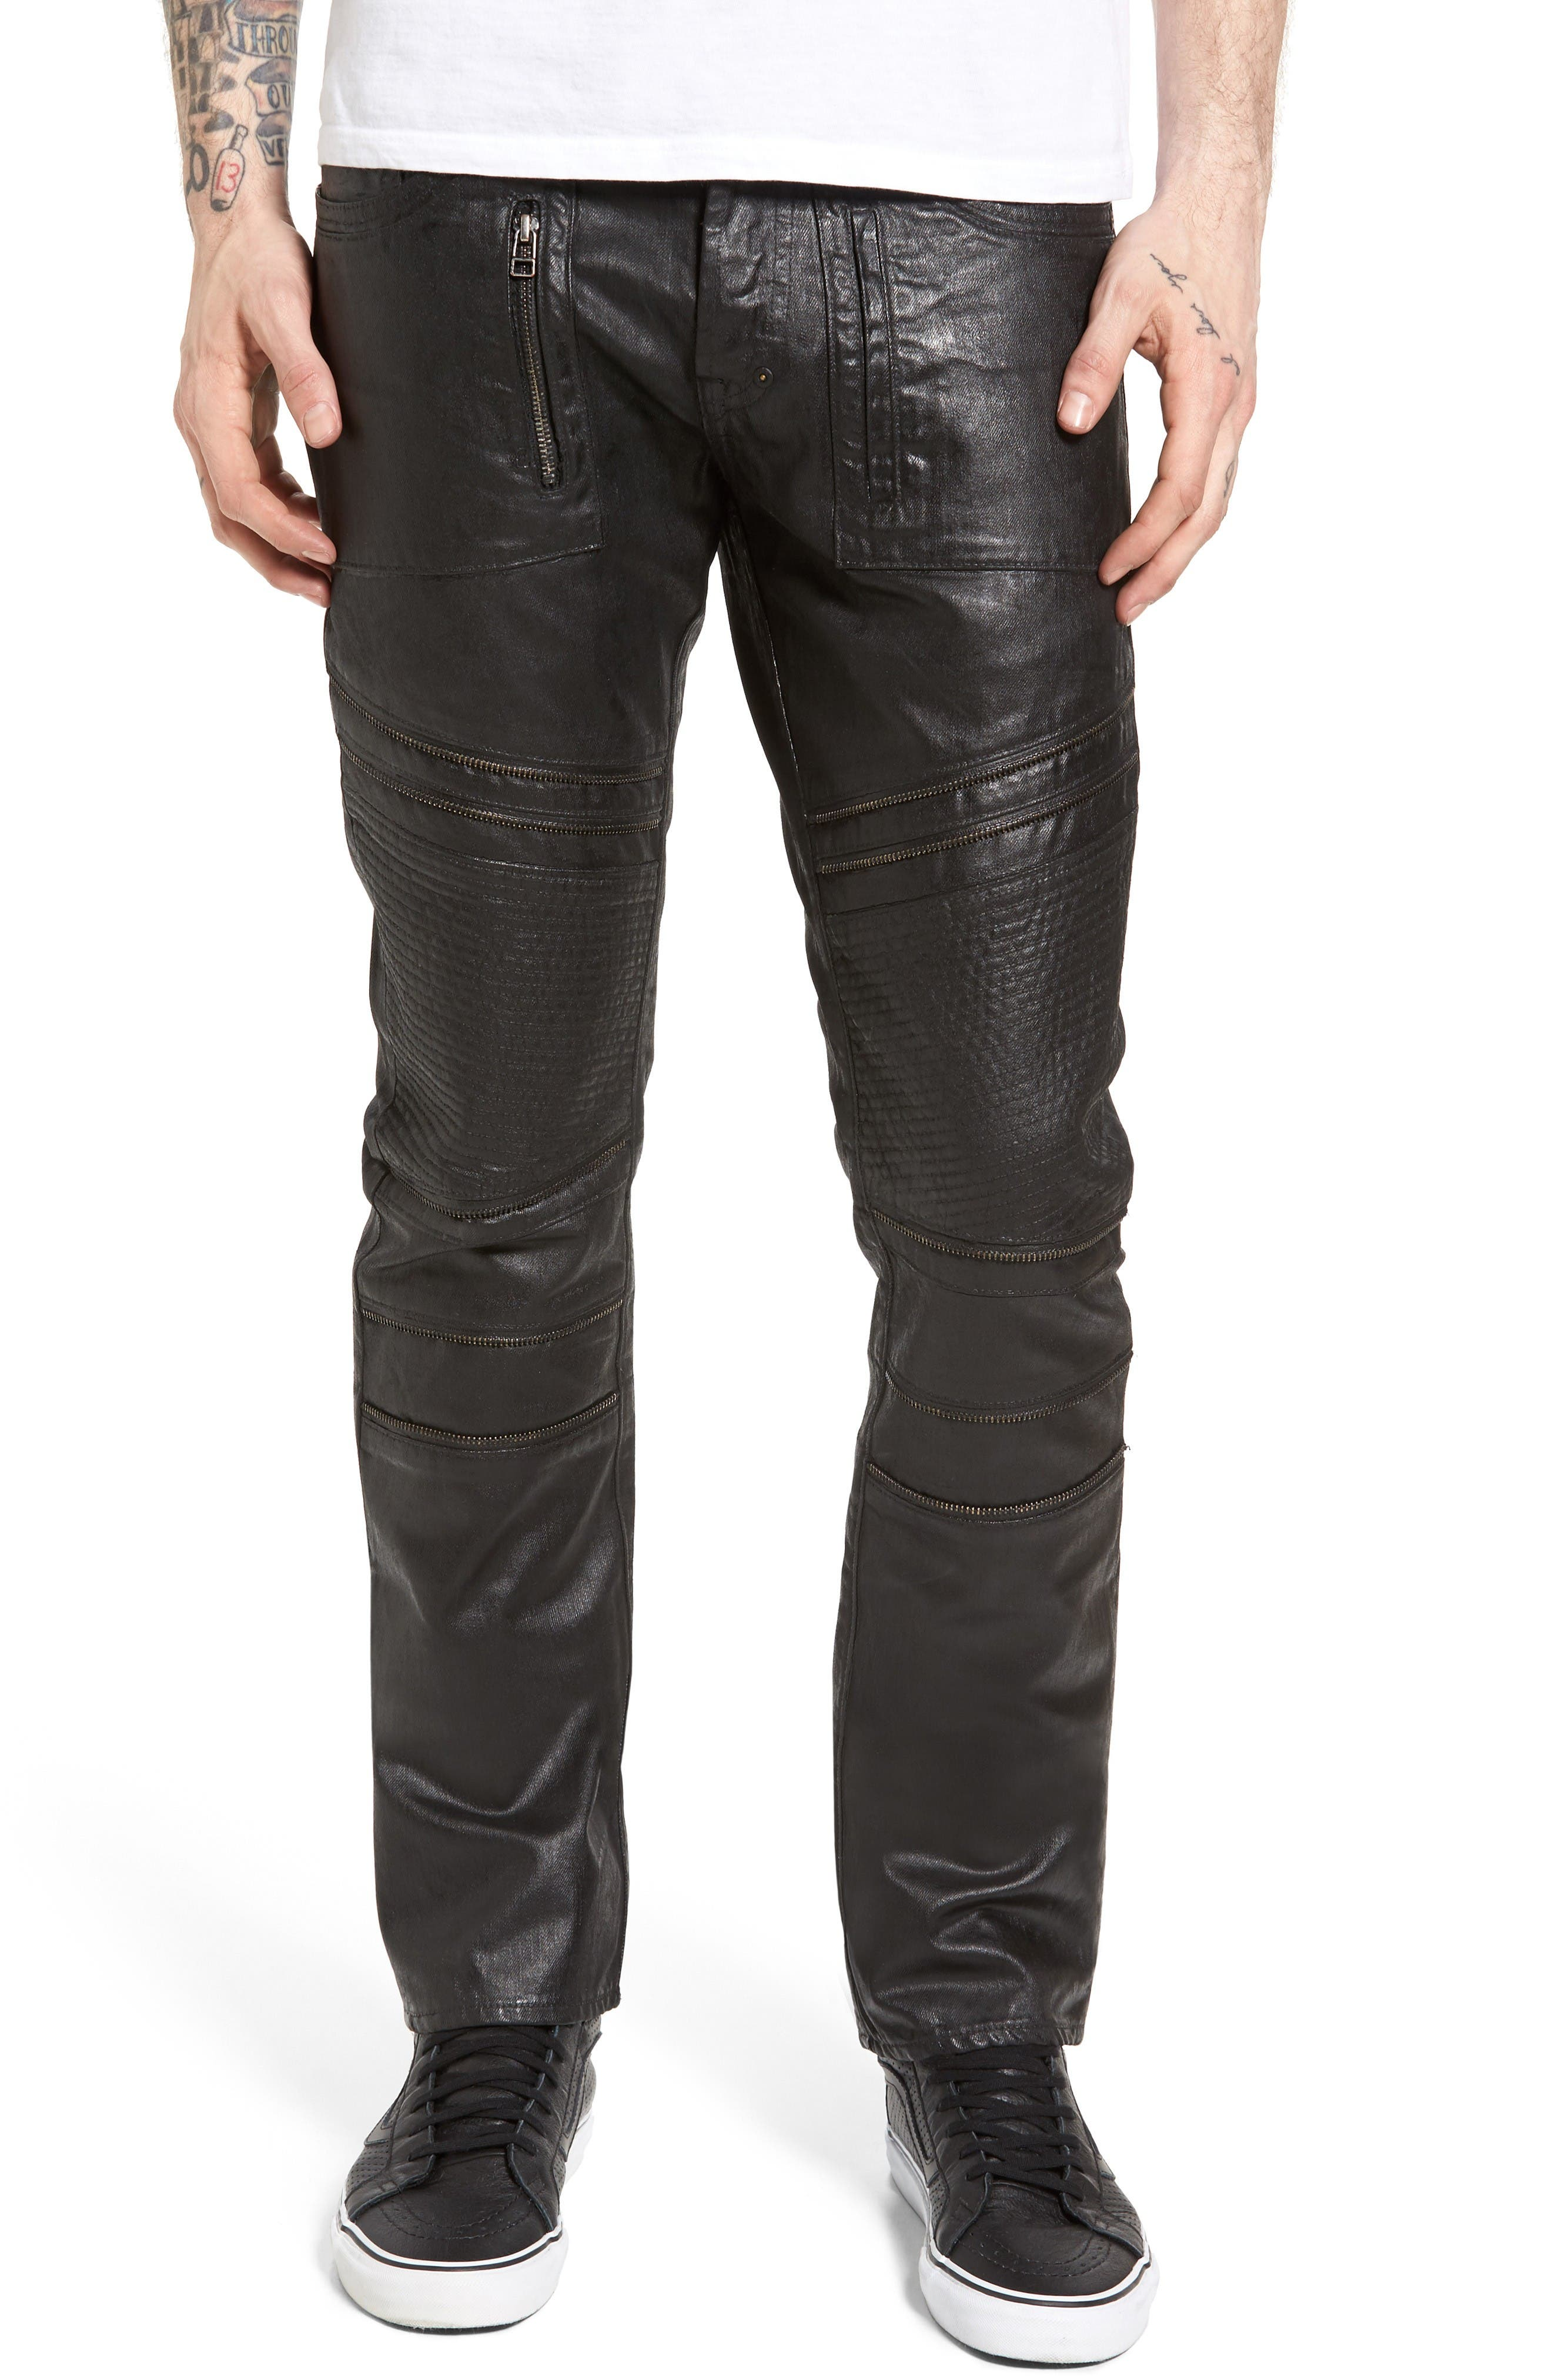 Demon Slim Straight Coated Jeans,                         Main,                         color, Black